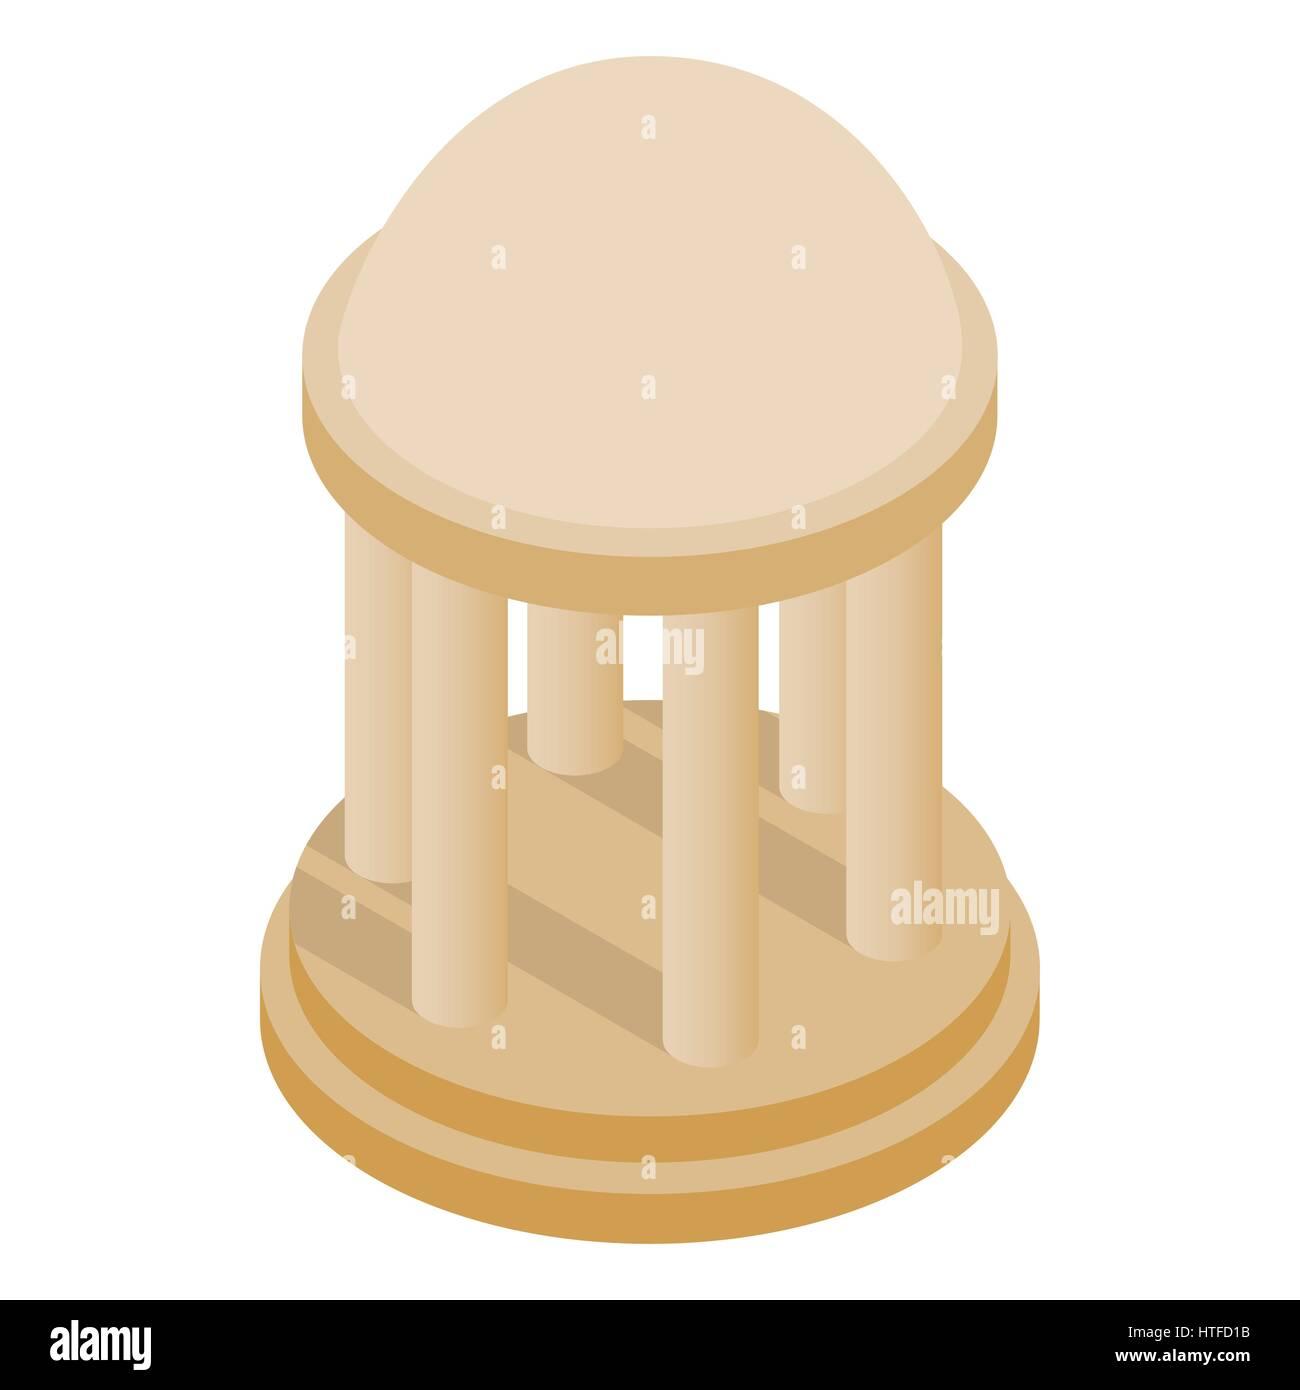 Rotunda icon, isometric 3d style - Stock Vector